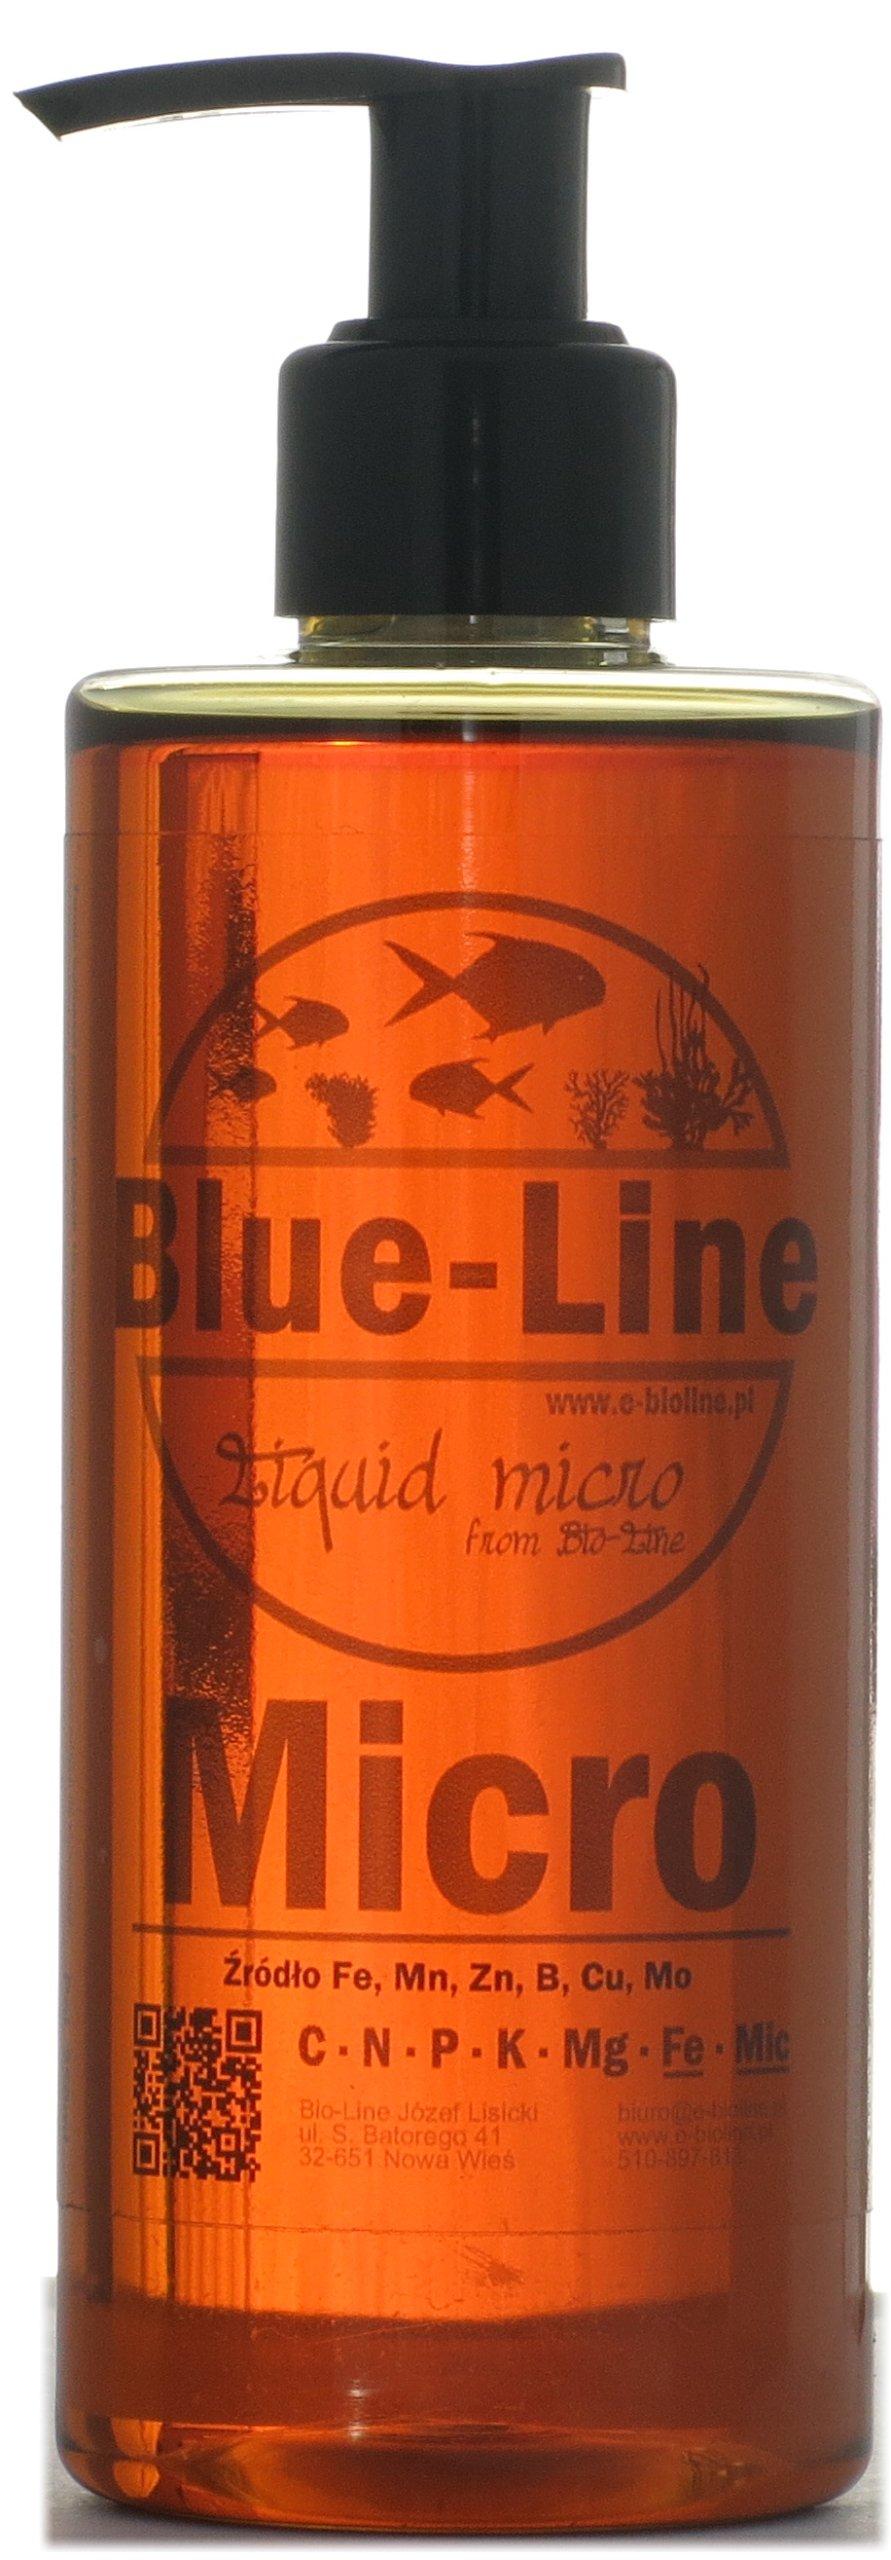 Blue-Line Micro nawóz do akwarium Mikro ! 500ml !